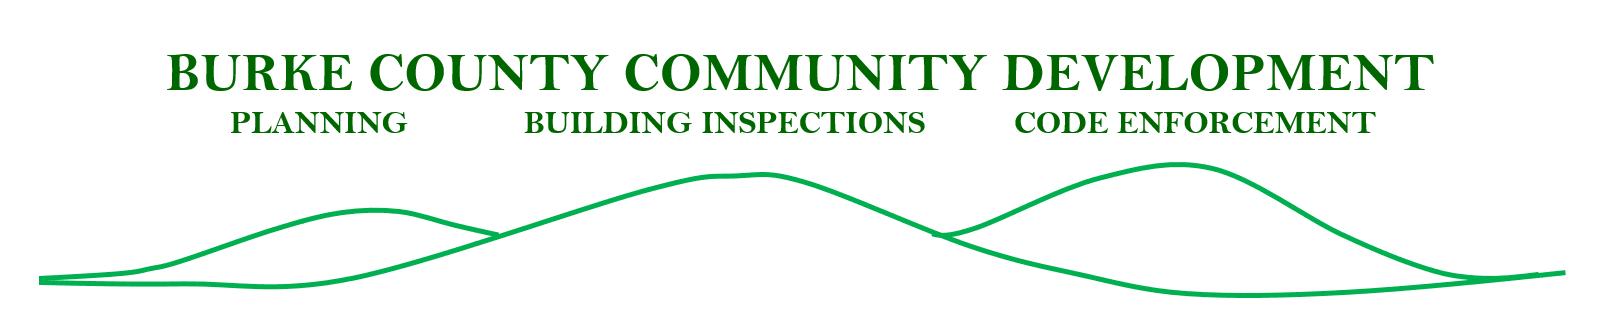 Community Developement Header